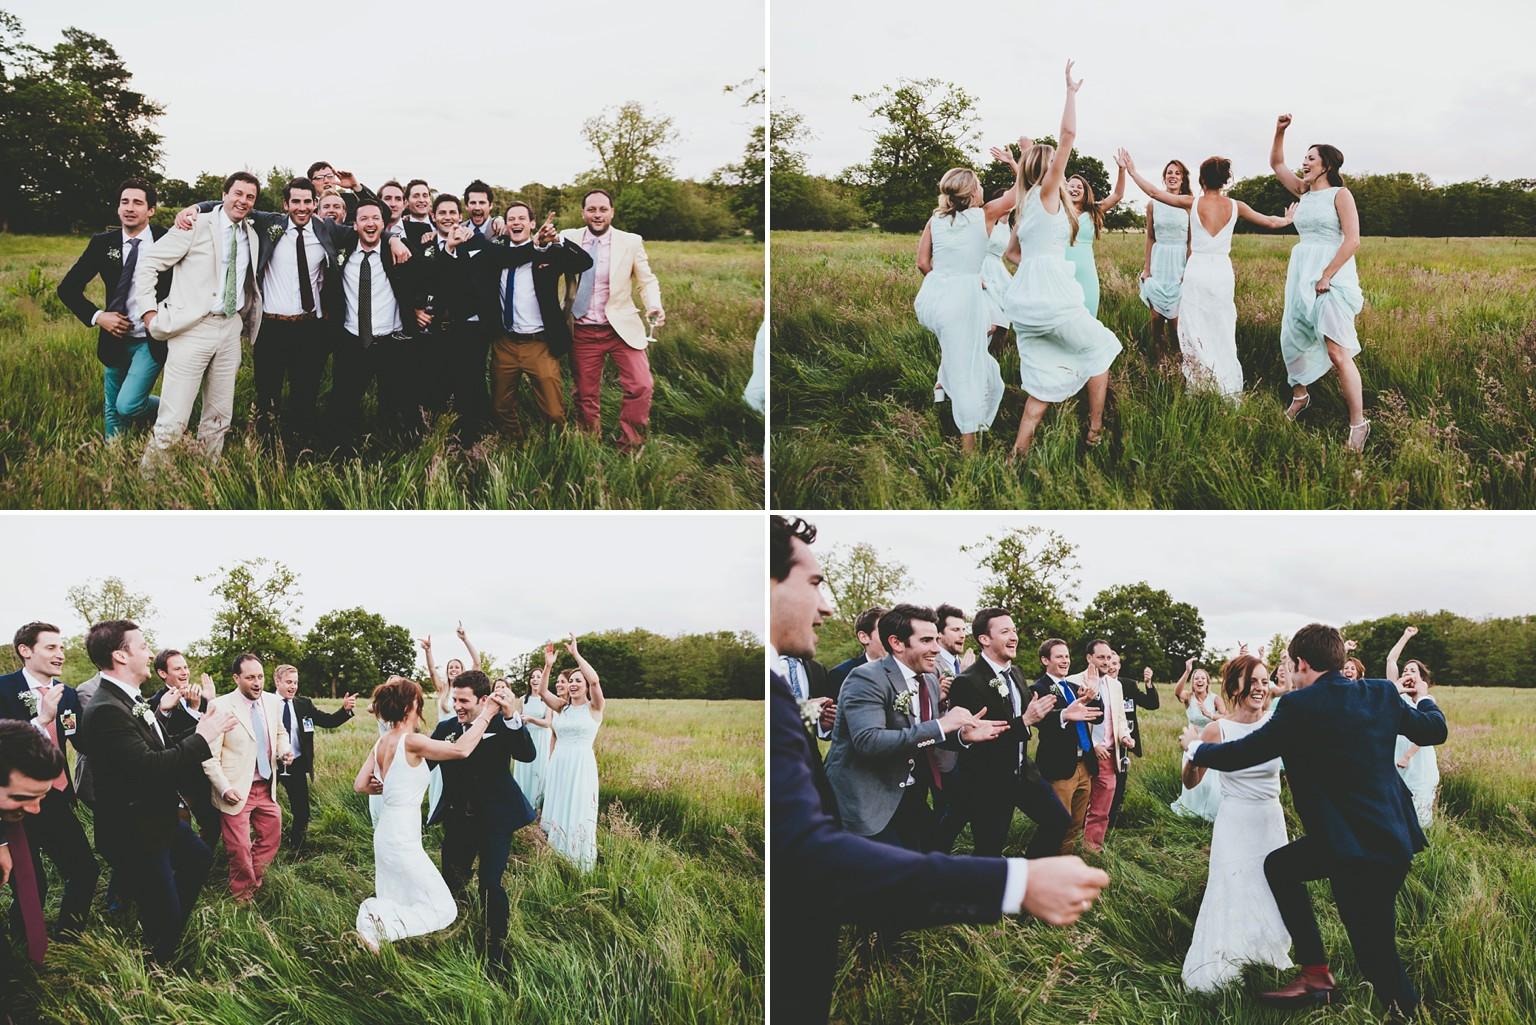 Creative-wedding-photographers-00010